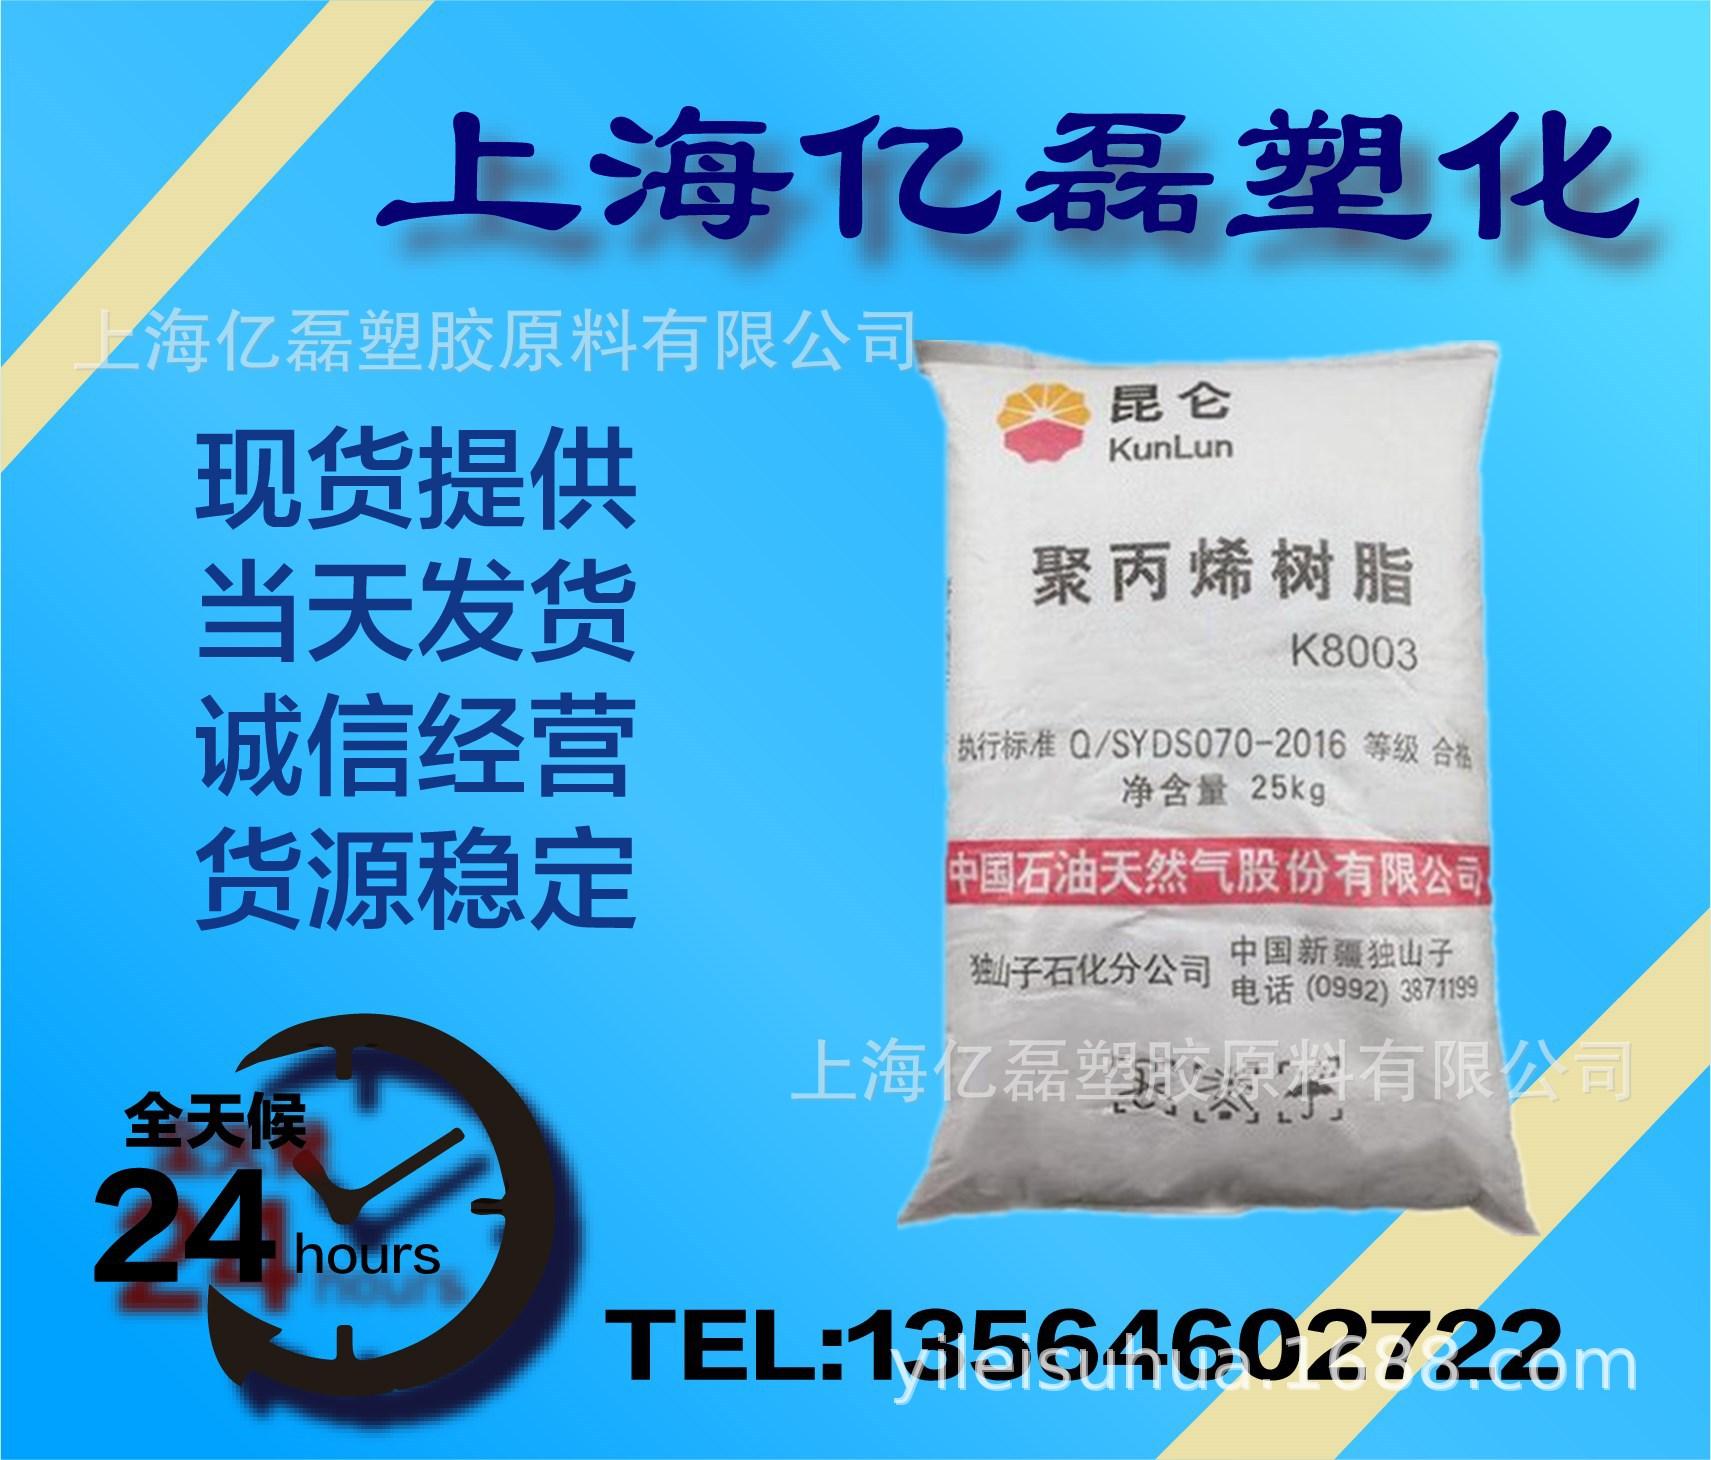 pp独山子石化/DMDA-8008 注塑级 高密度聚乙烯树脂 塑胶原料